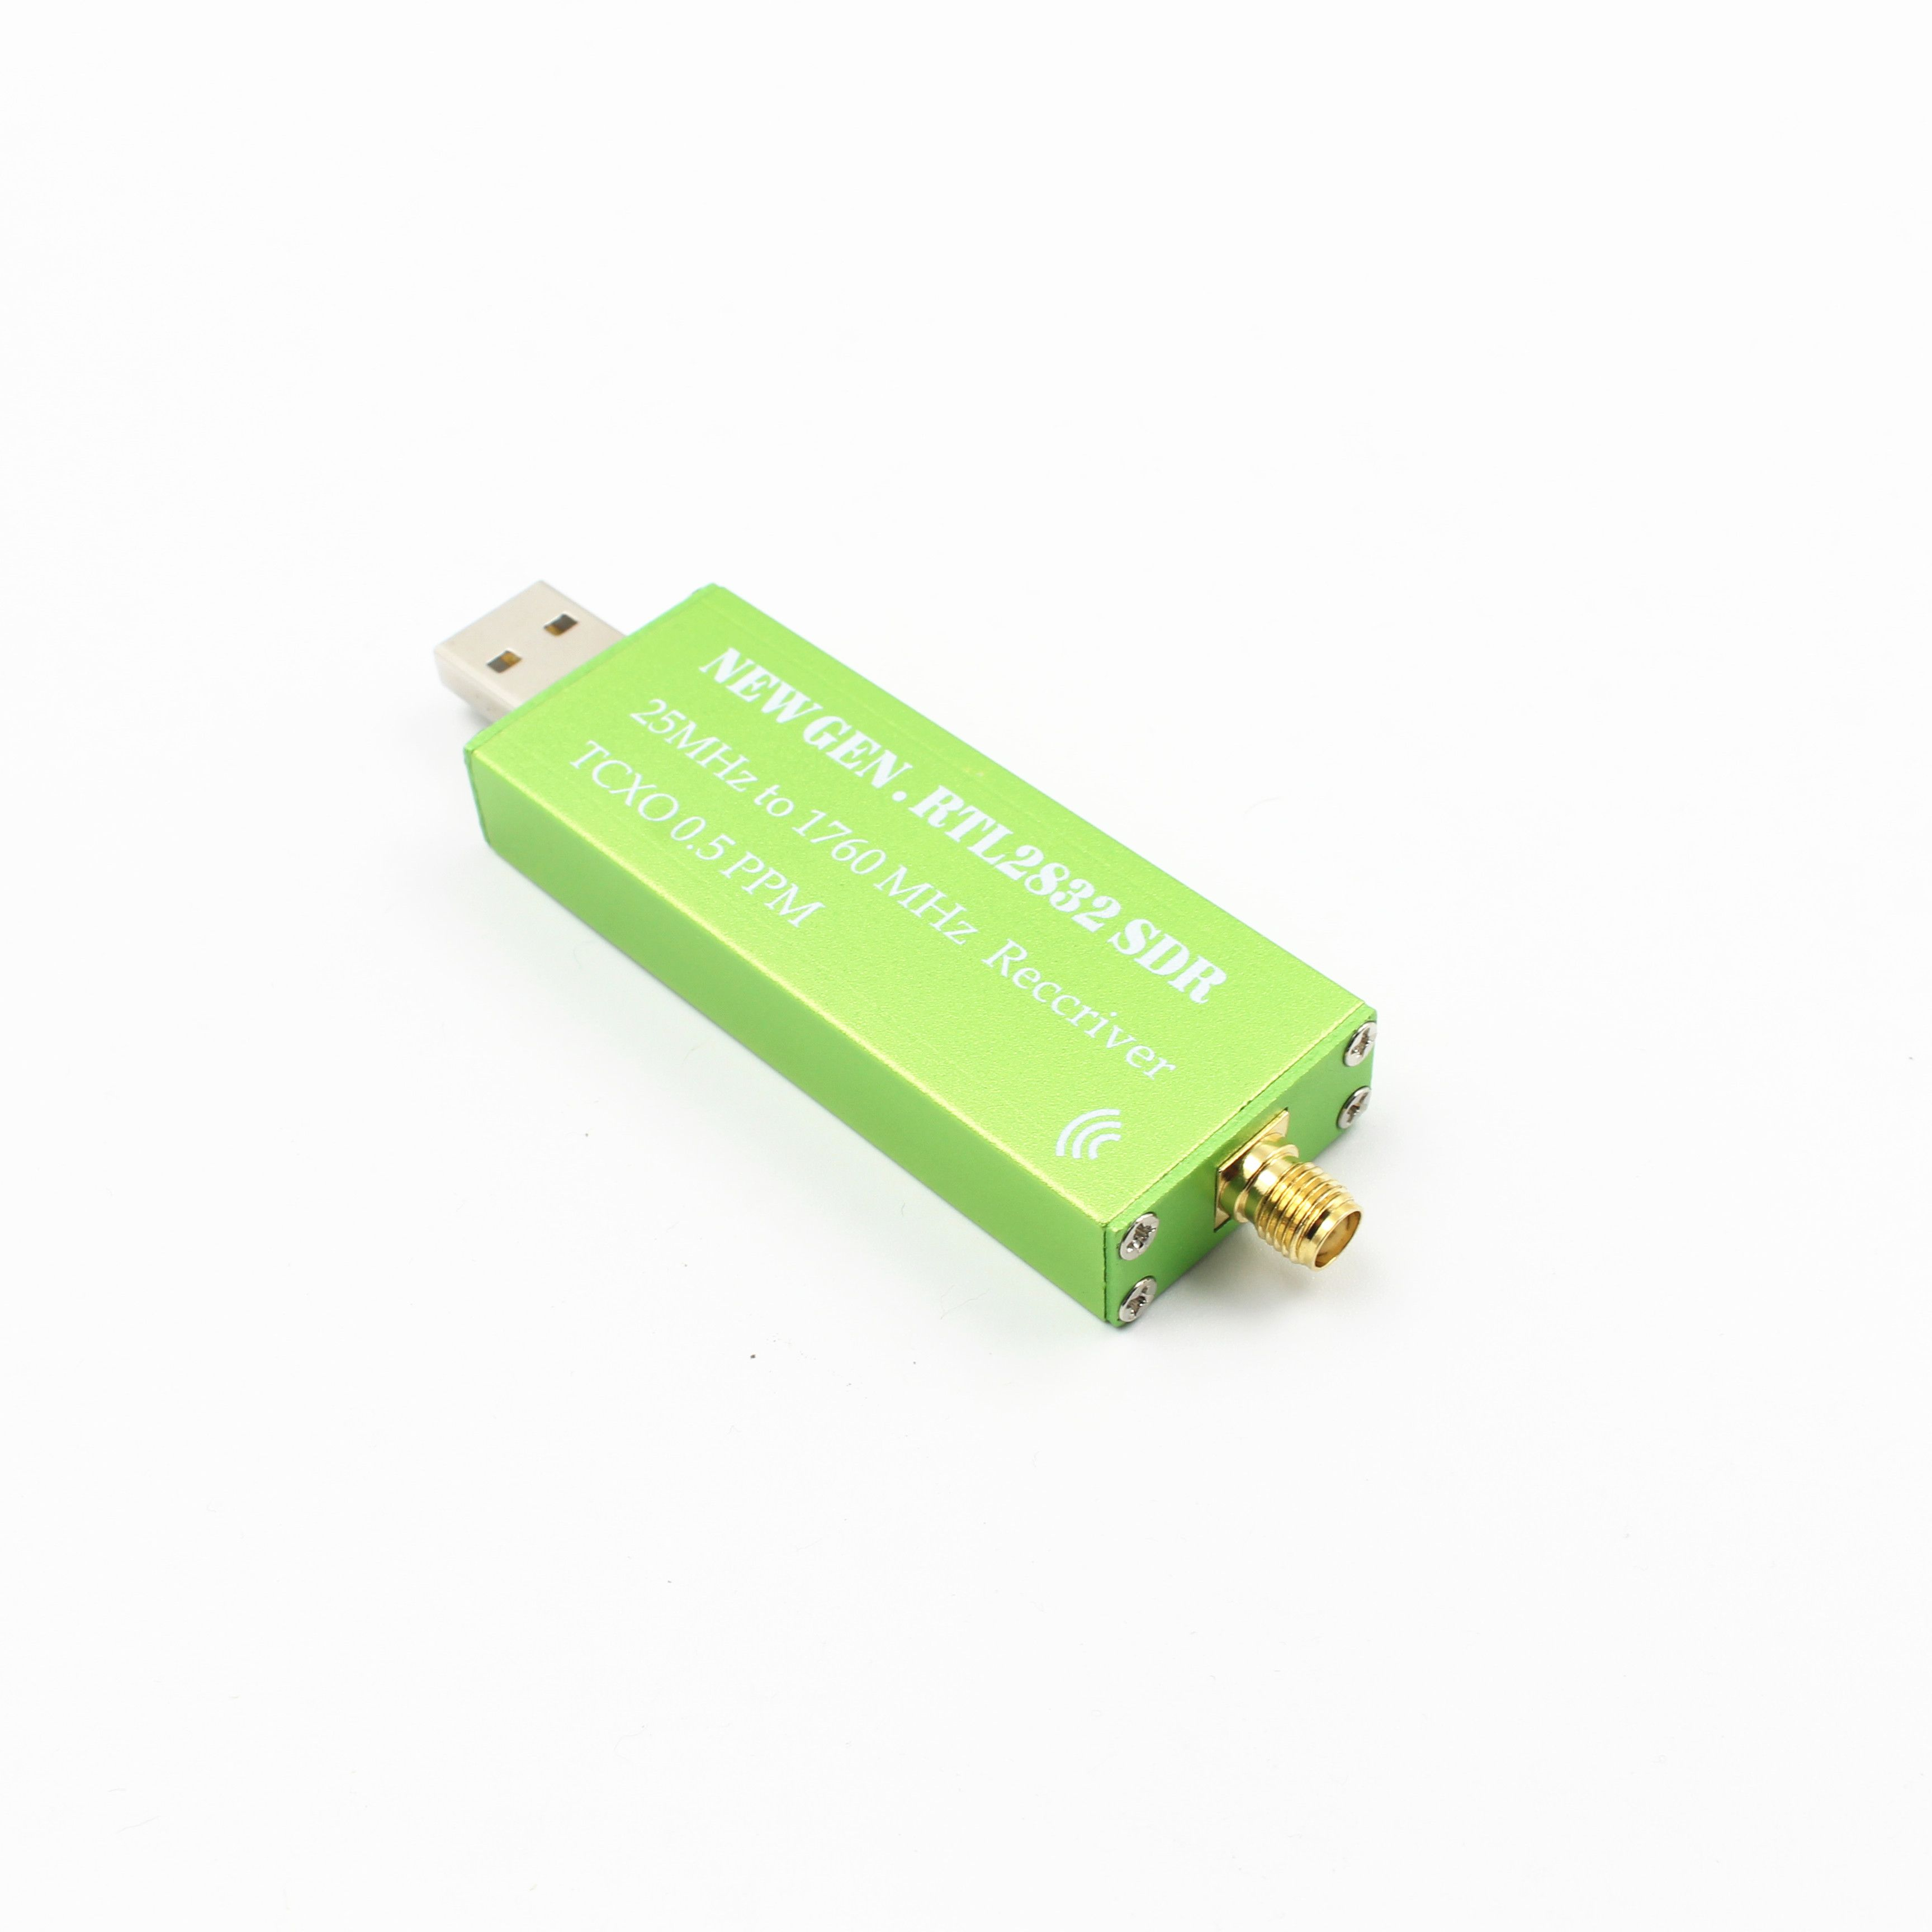 Premium USB RTL-SDR w/ 0.5PPM TCXO, Metal Case, SMA. R820T2 RTL2832U